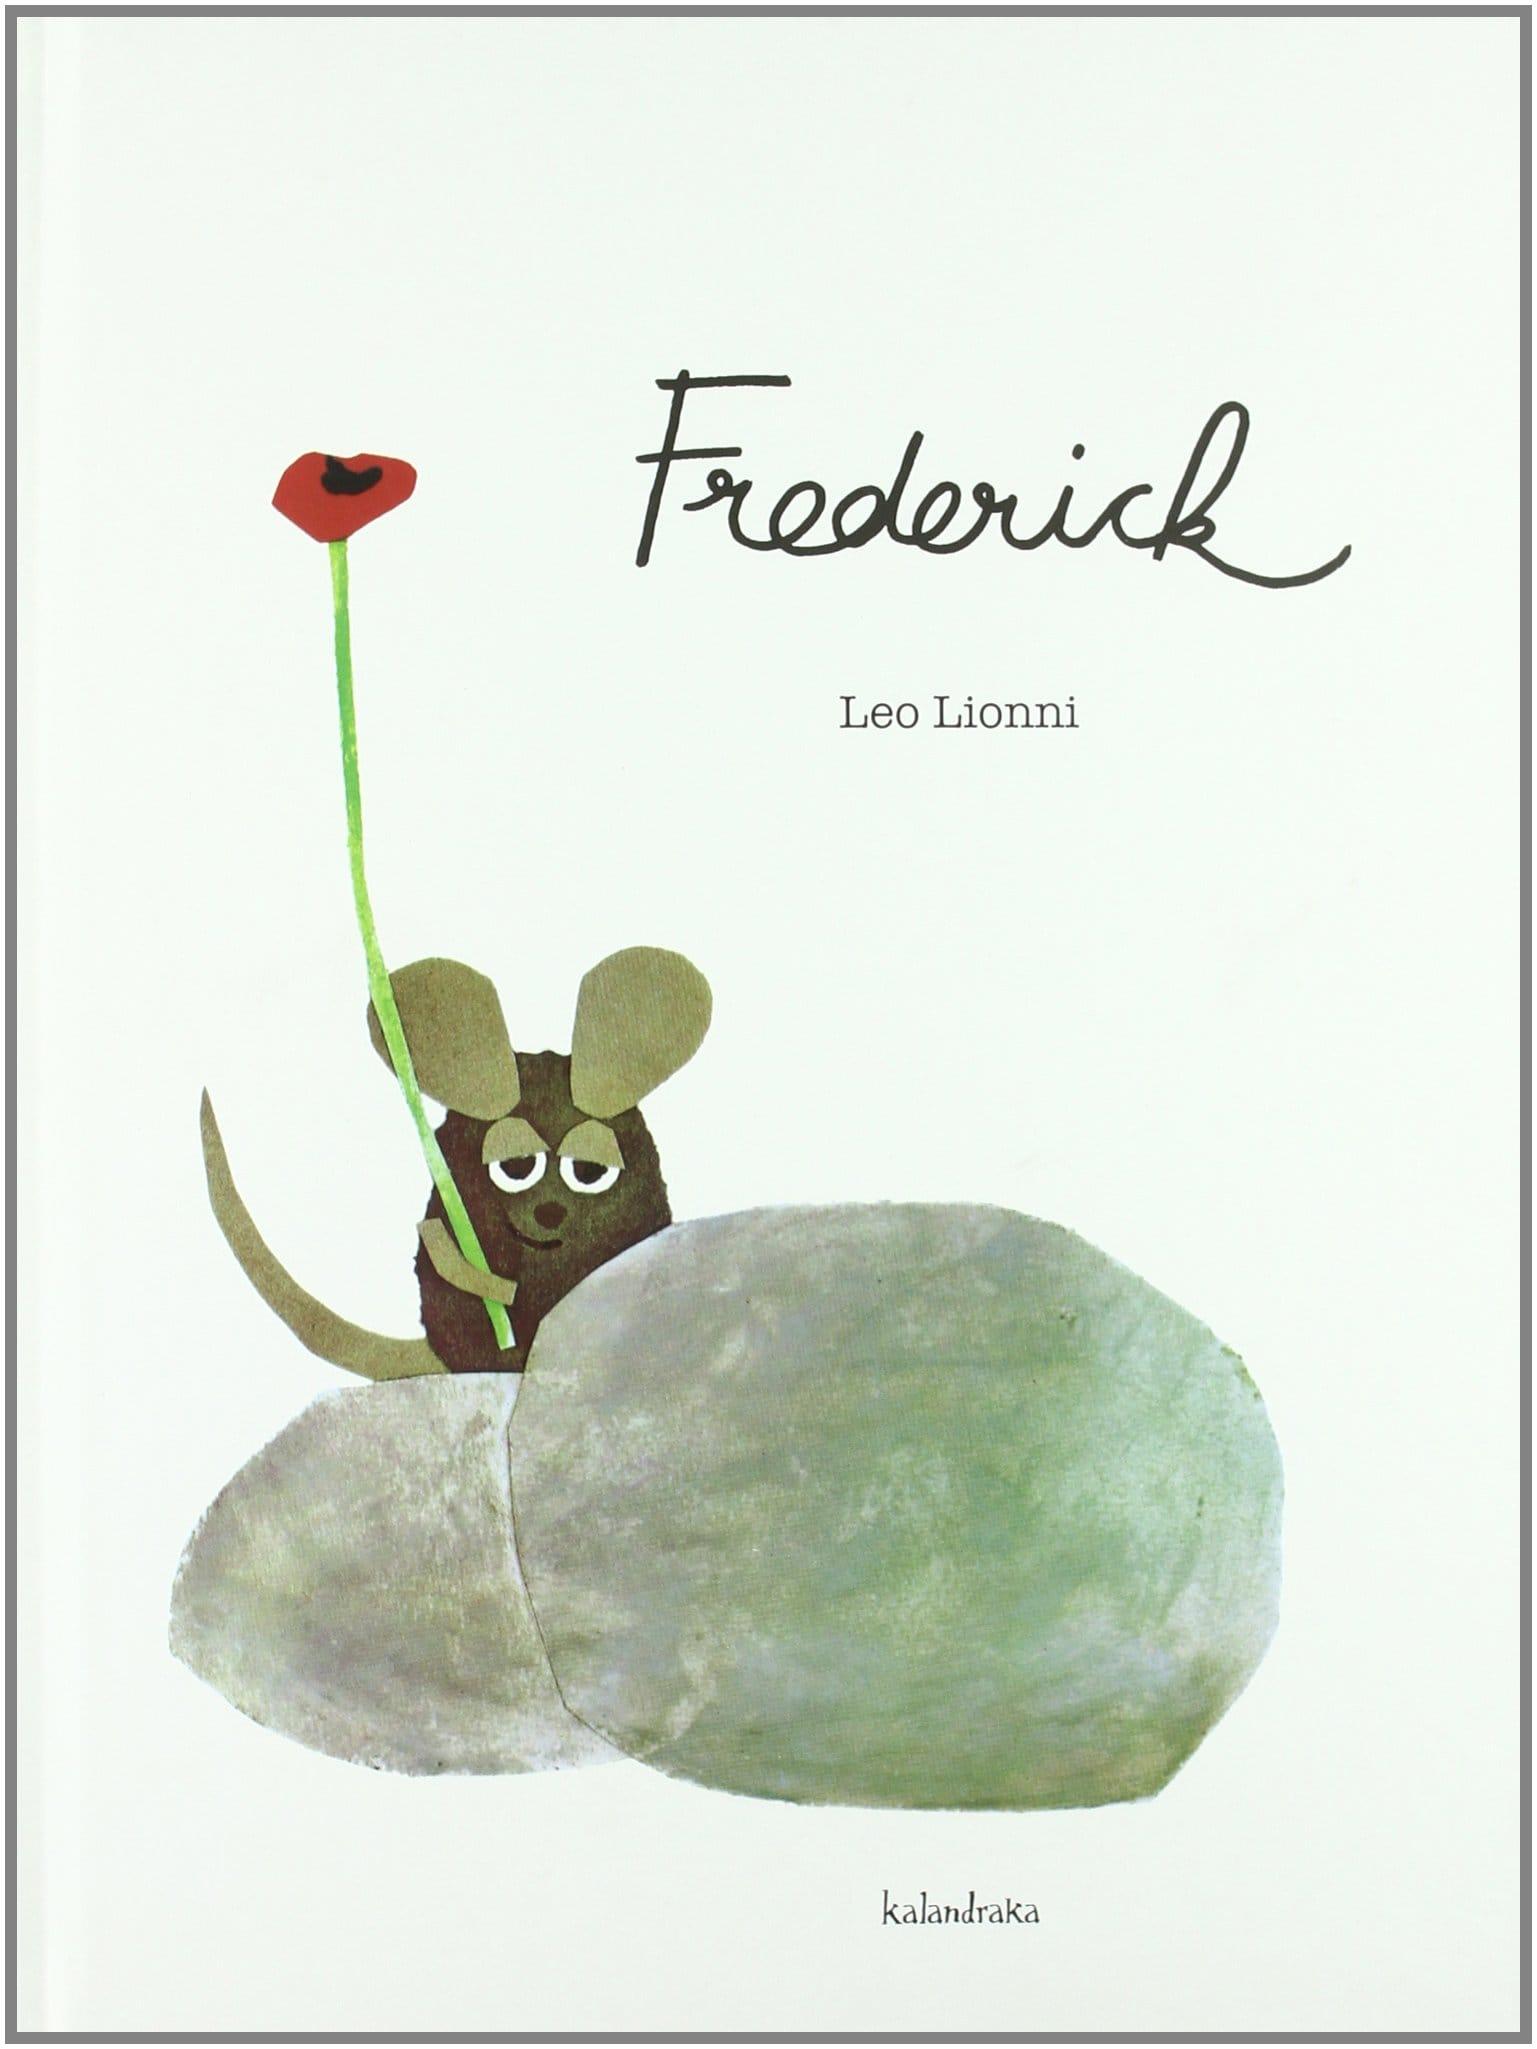 Frederick, de Leo Lionni - Pekeleke